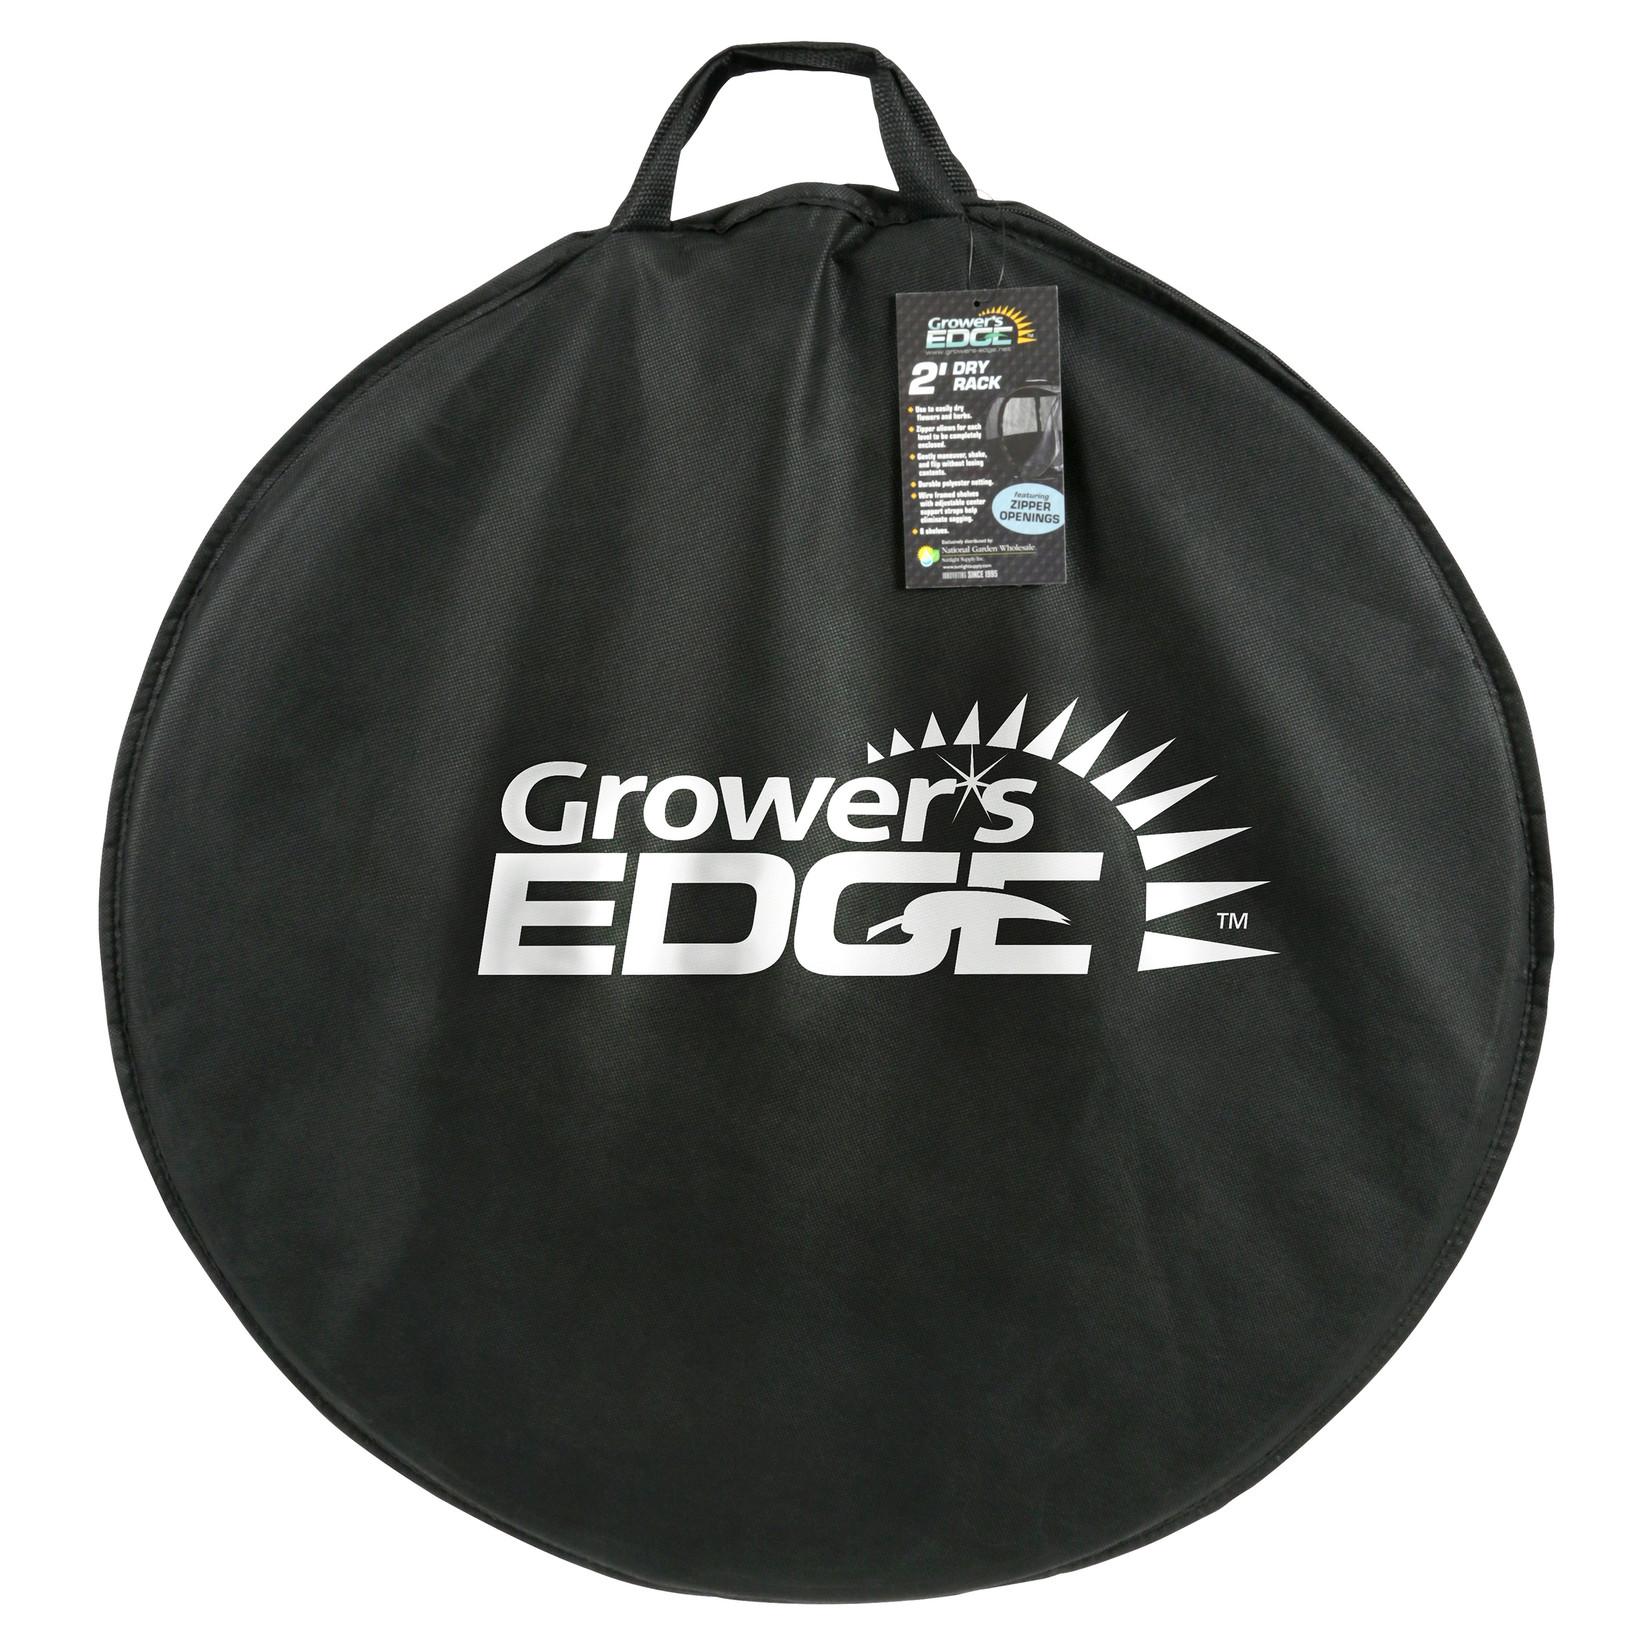 growers edge Grower's Edge Dry Rack Enclosed w/ Zipper Opening - 2 ft